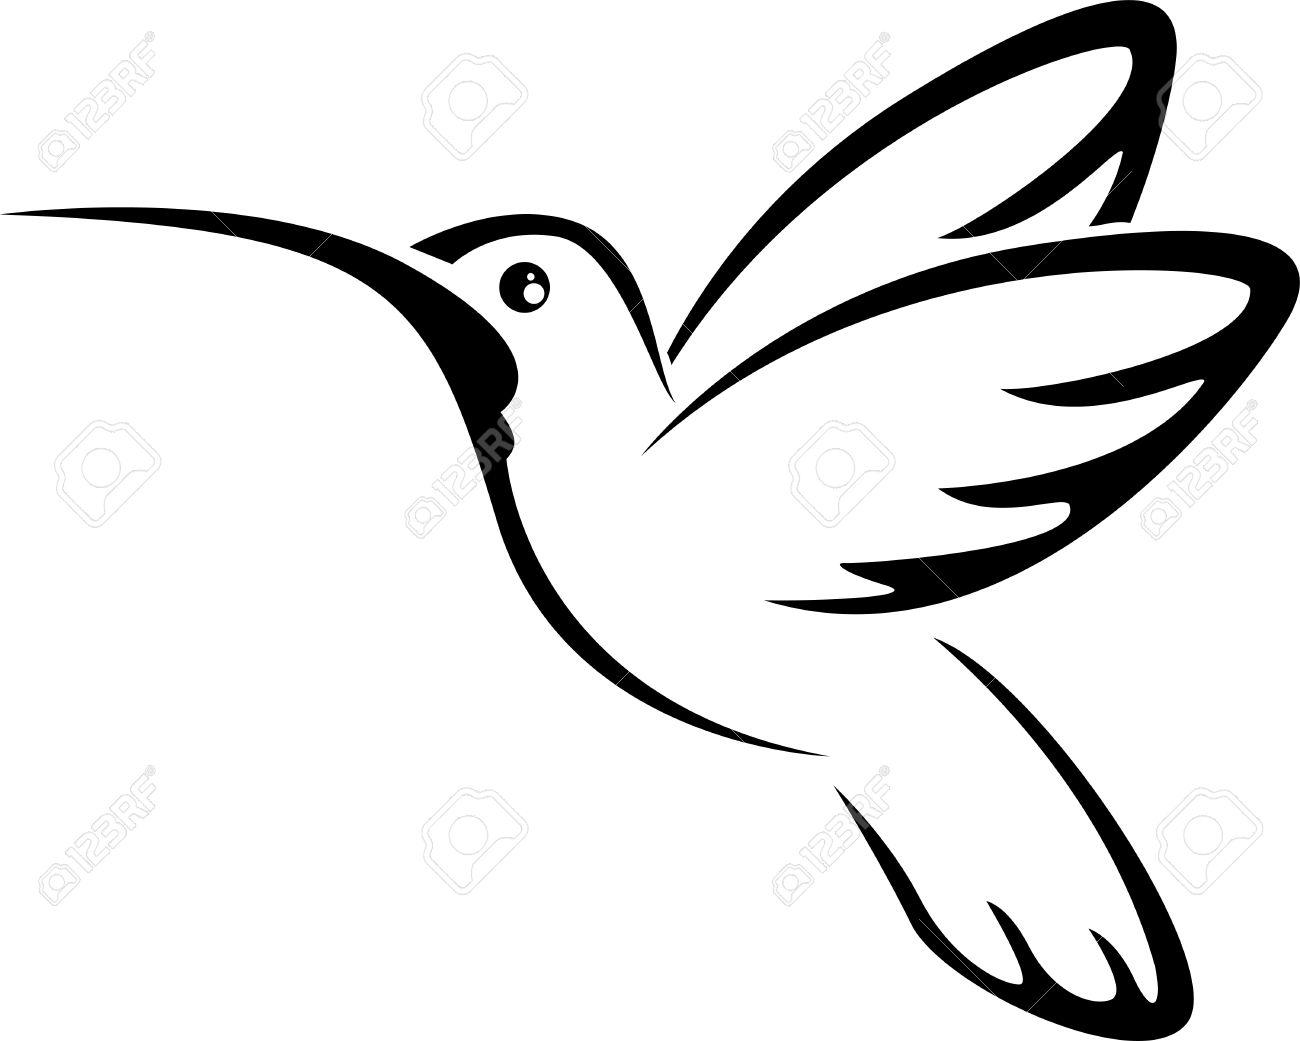 Tattoo hummingbird for you design - 41506566